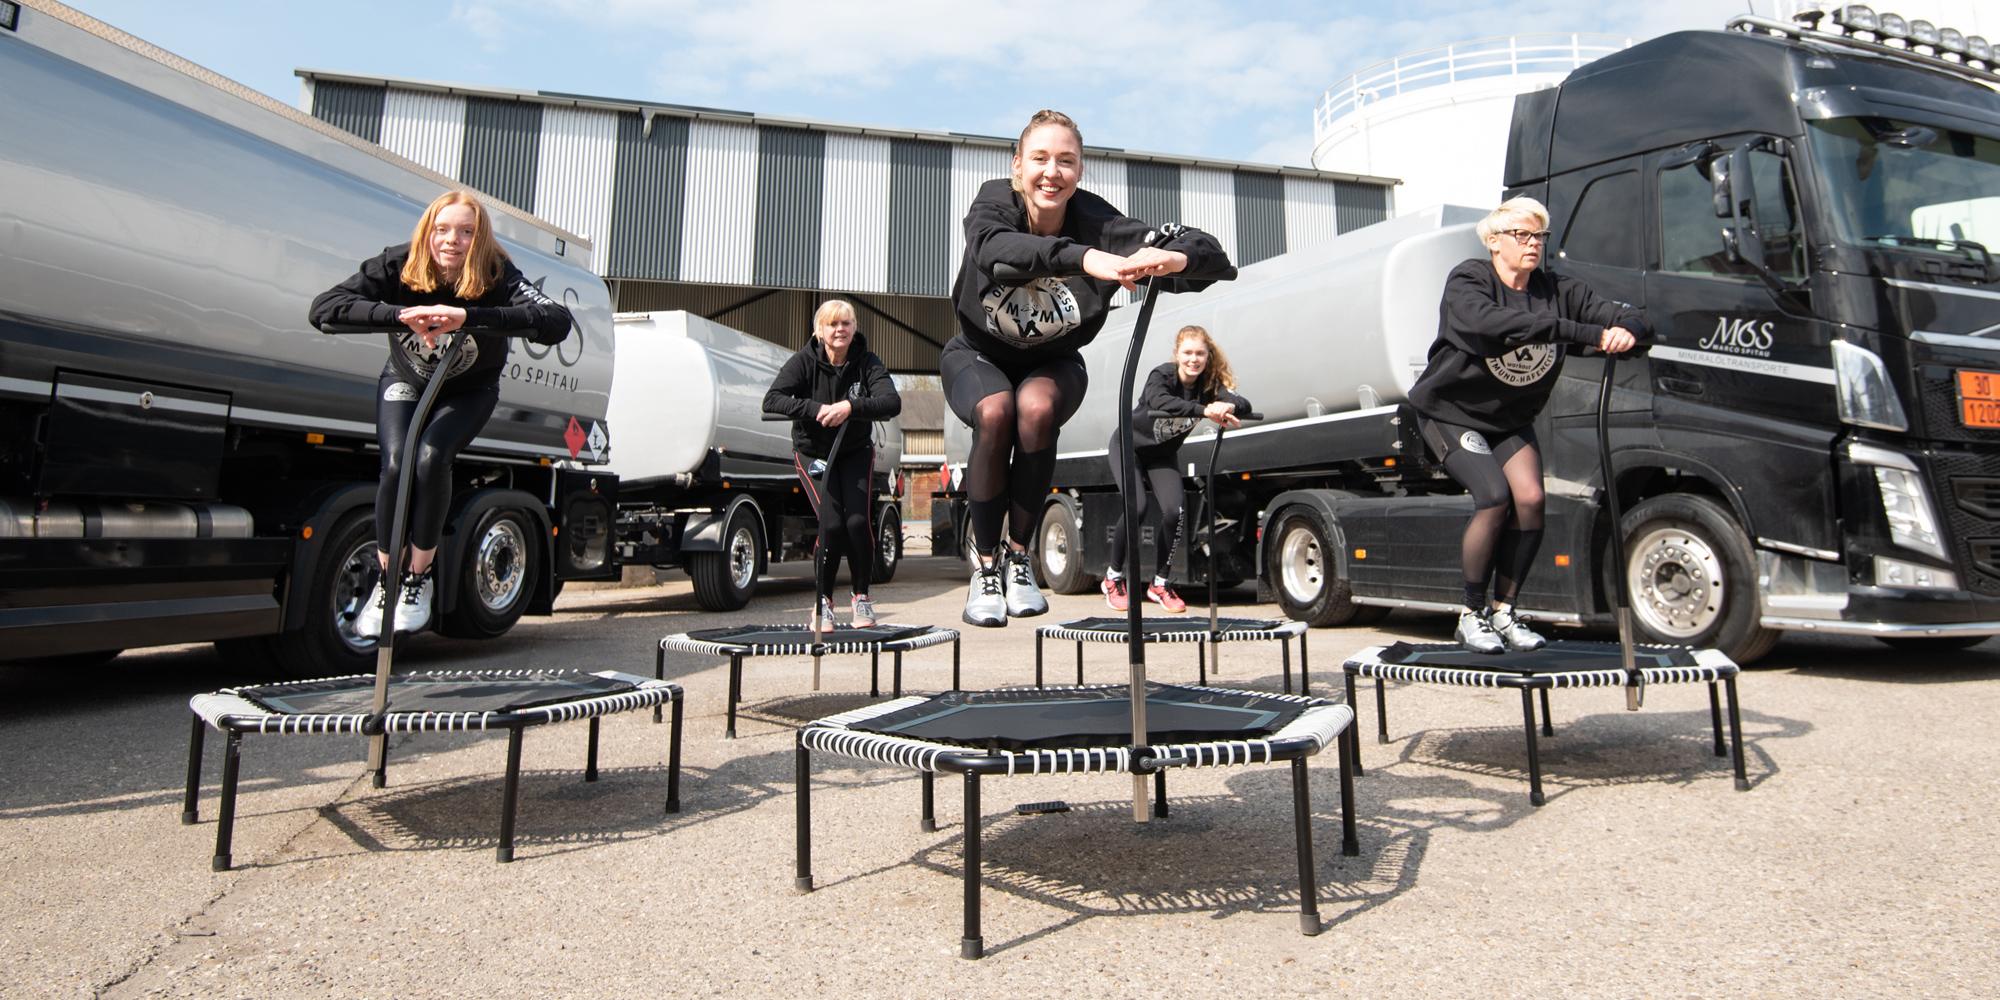 08-mm-workout-jumping-fitness-dortmund